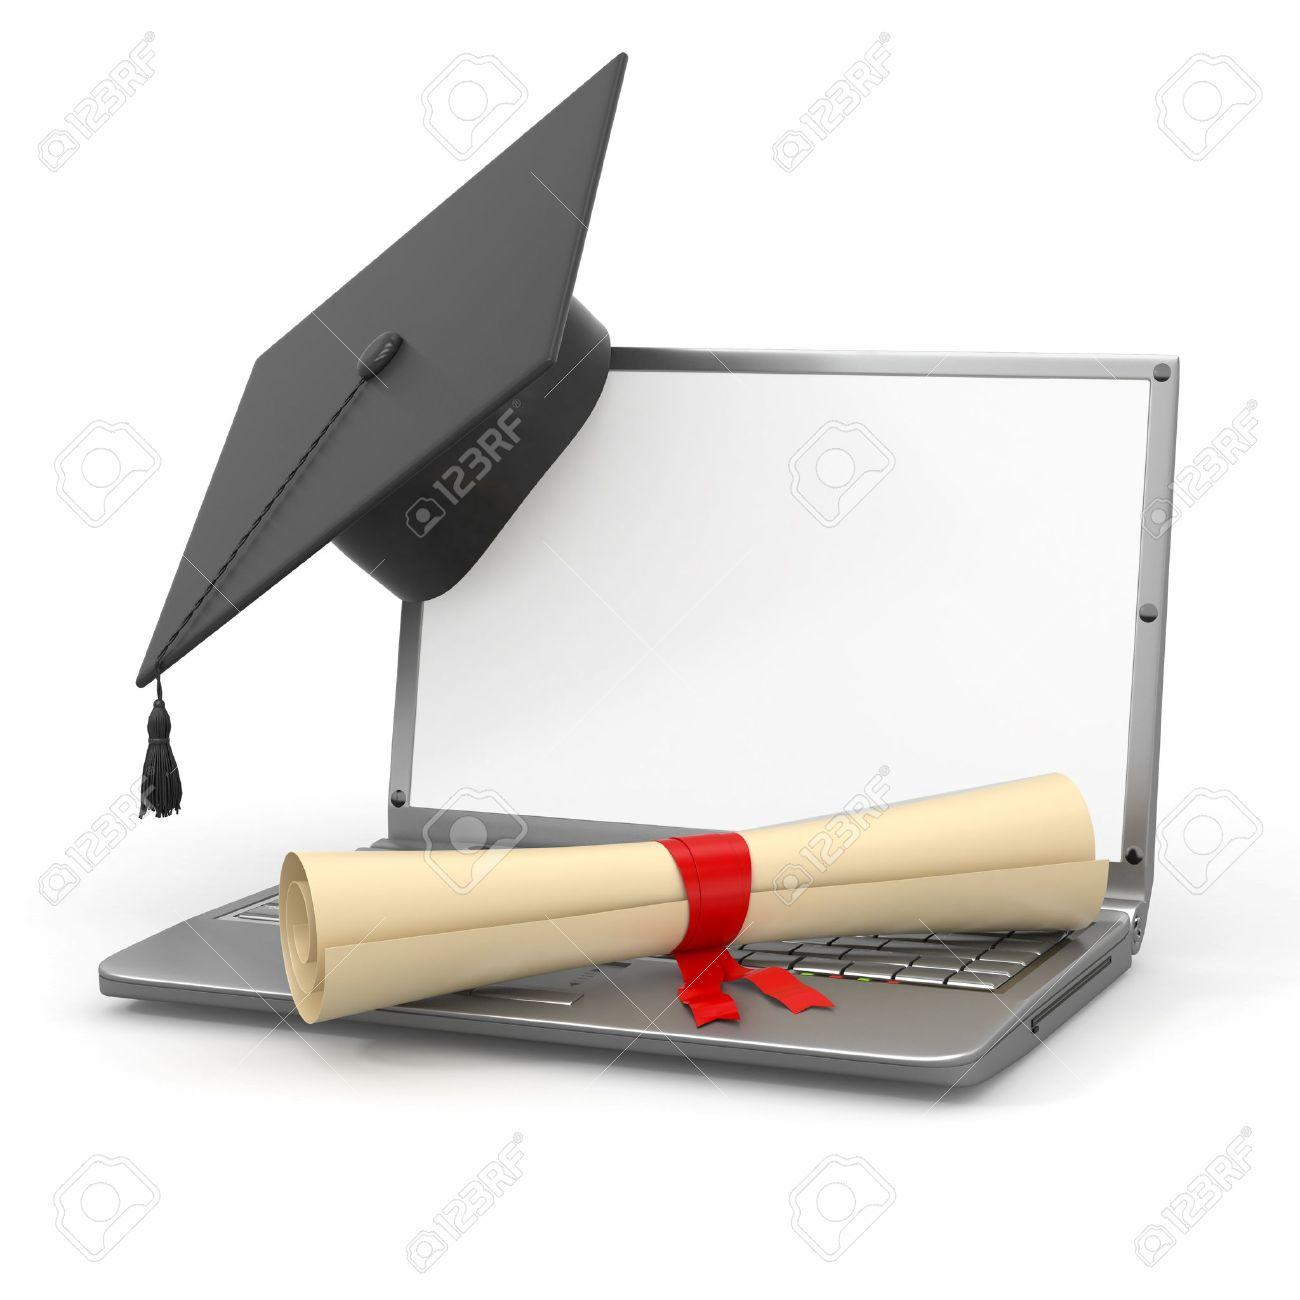 E Learning Studium Laptop Diplom Und Mörtel Bord 3d Lizenzfreie